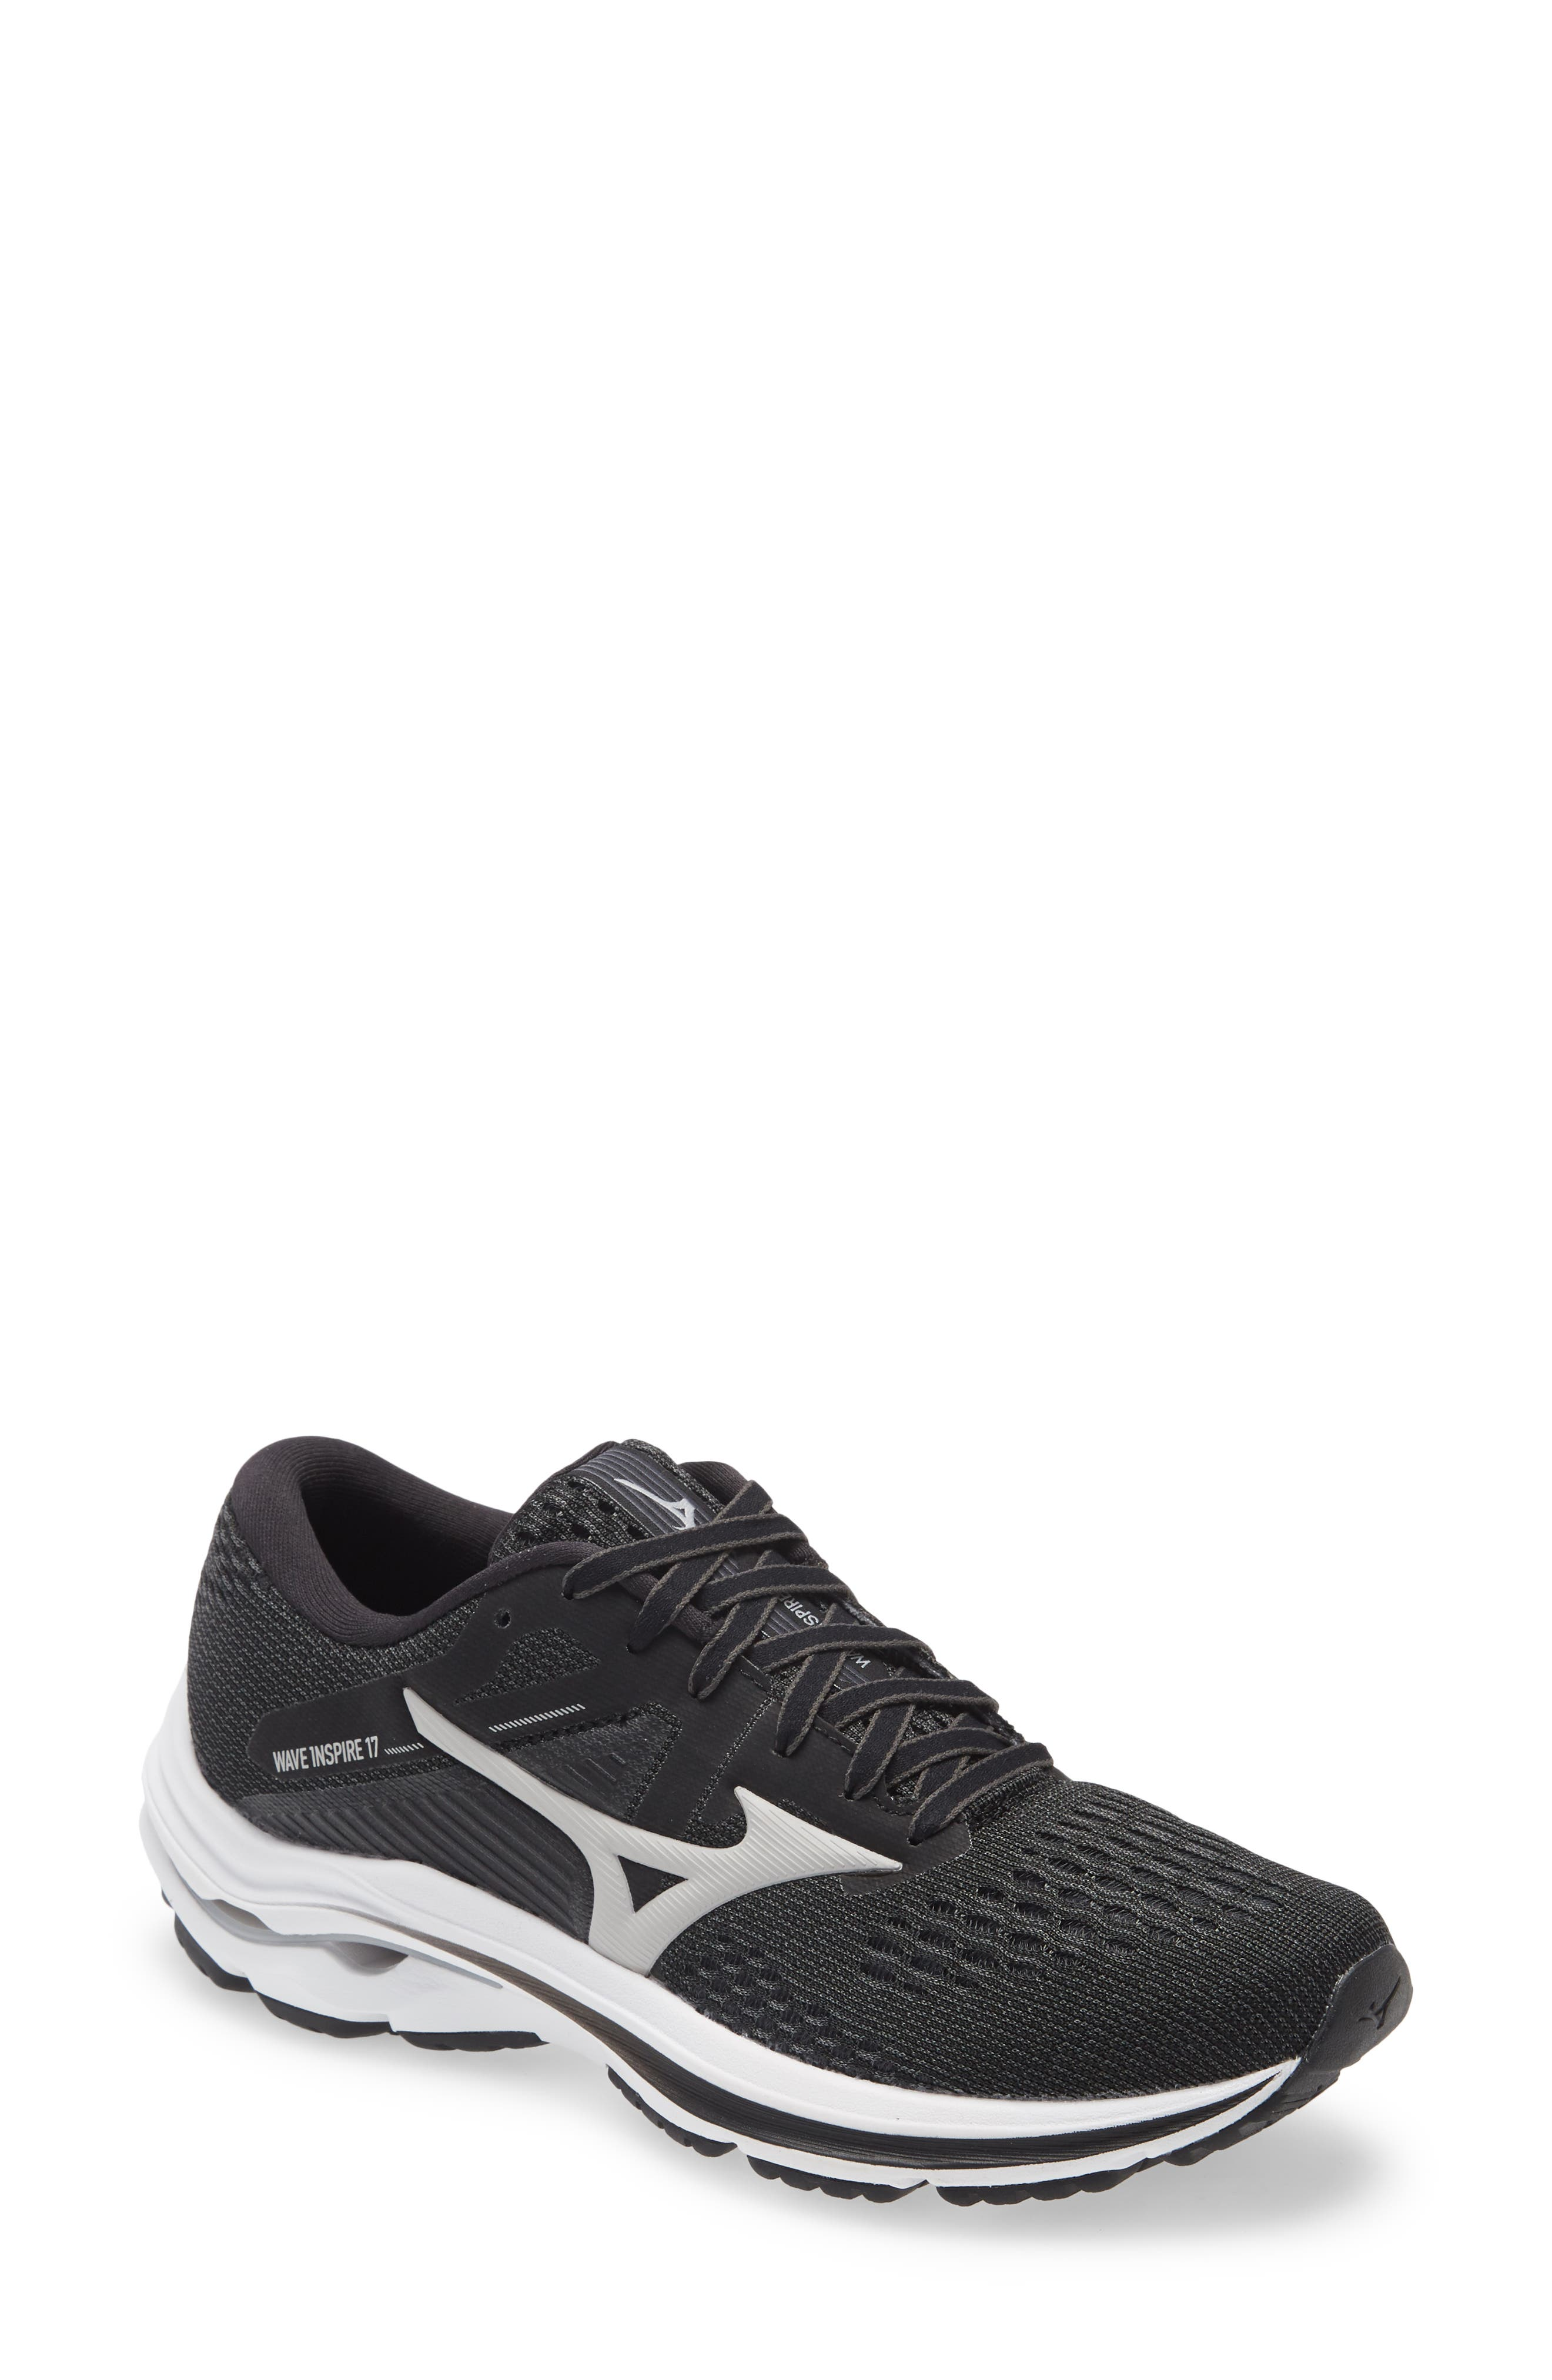 Wave Inspire 17 Running Shoe